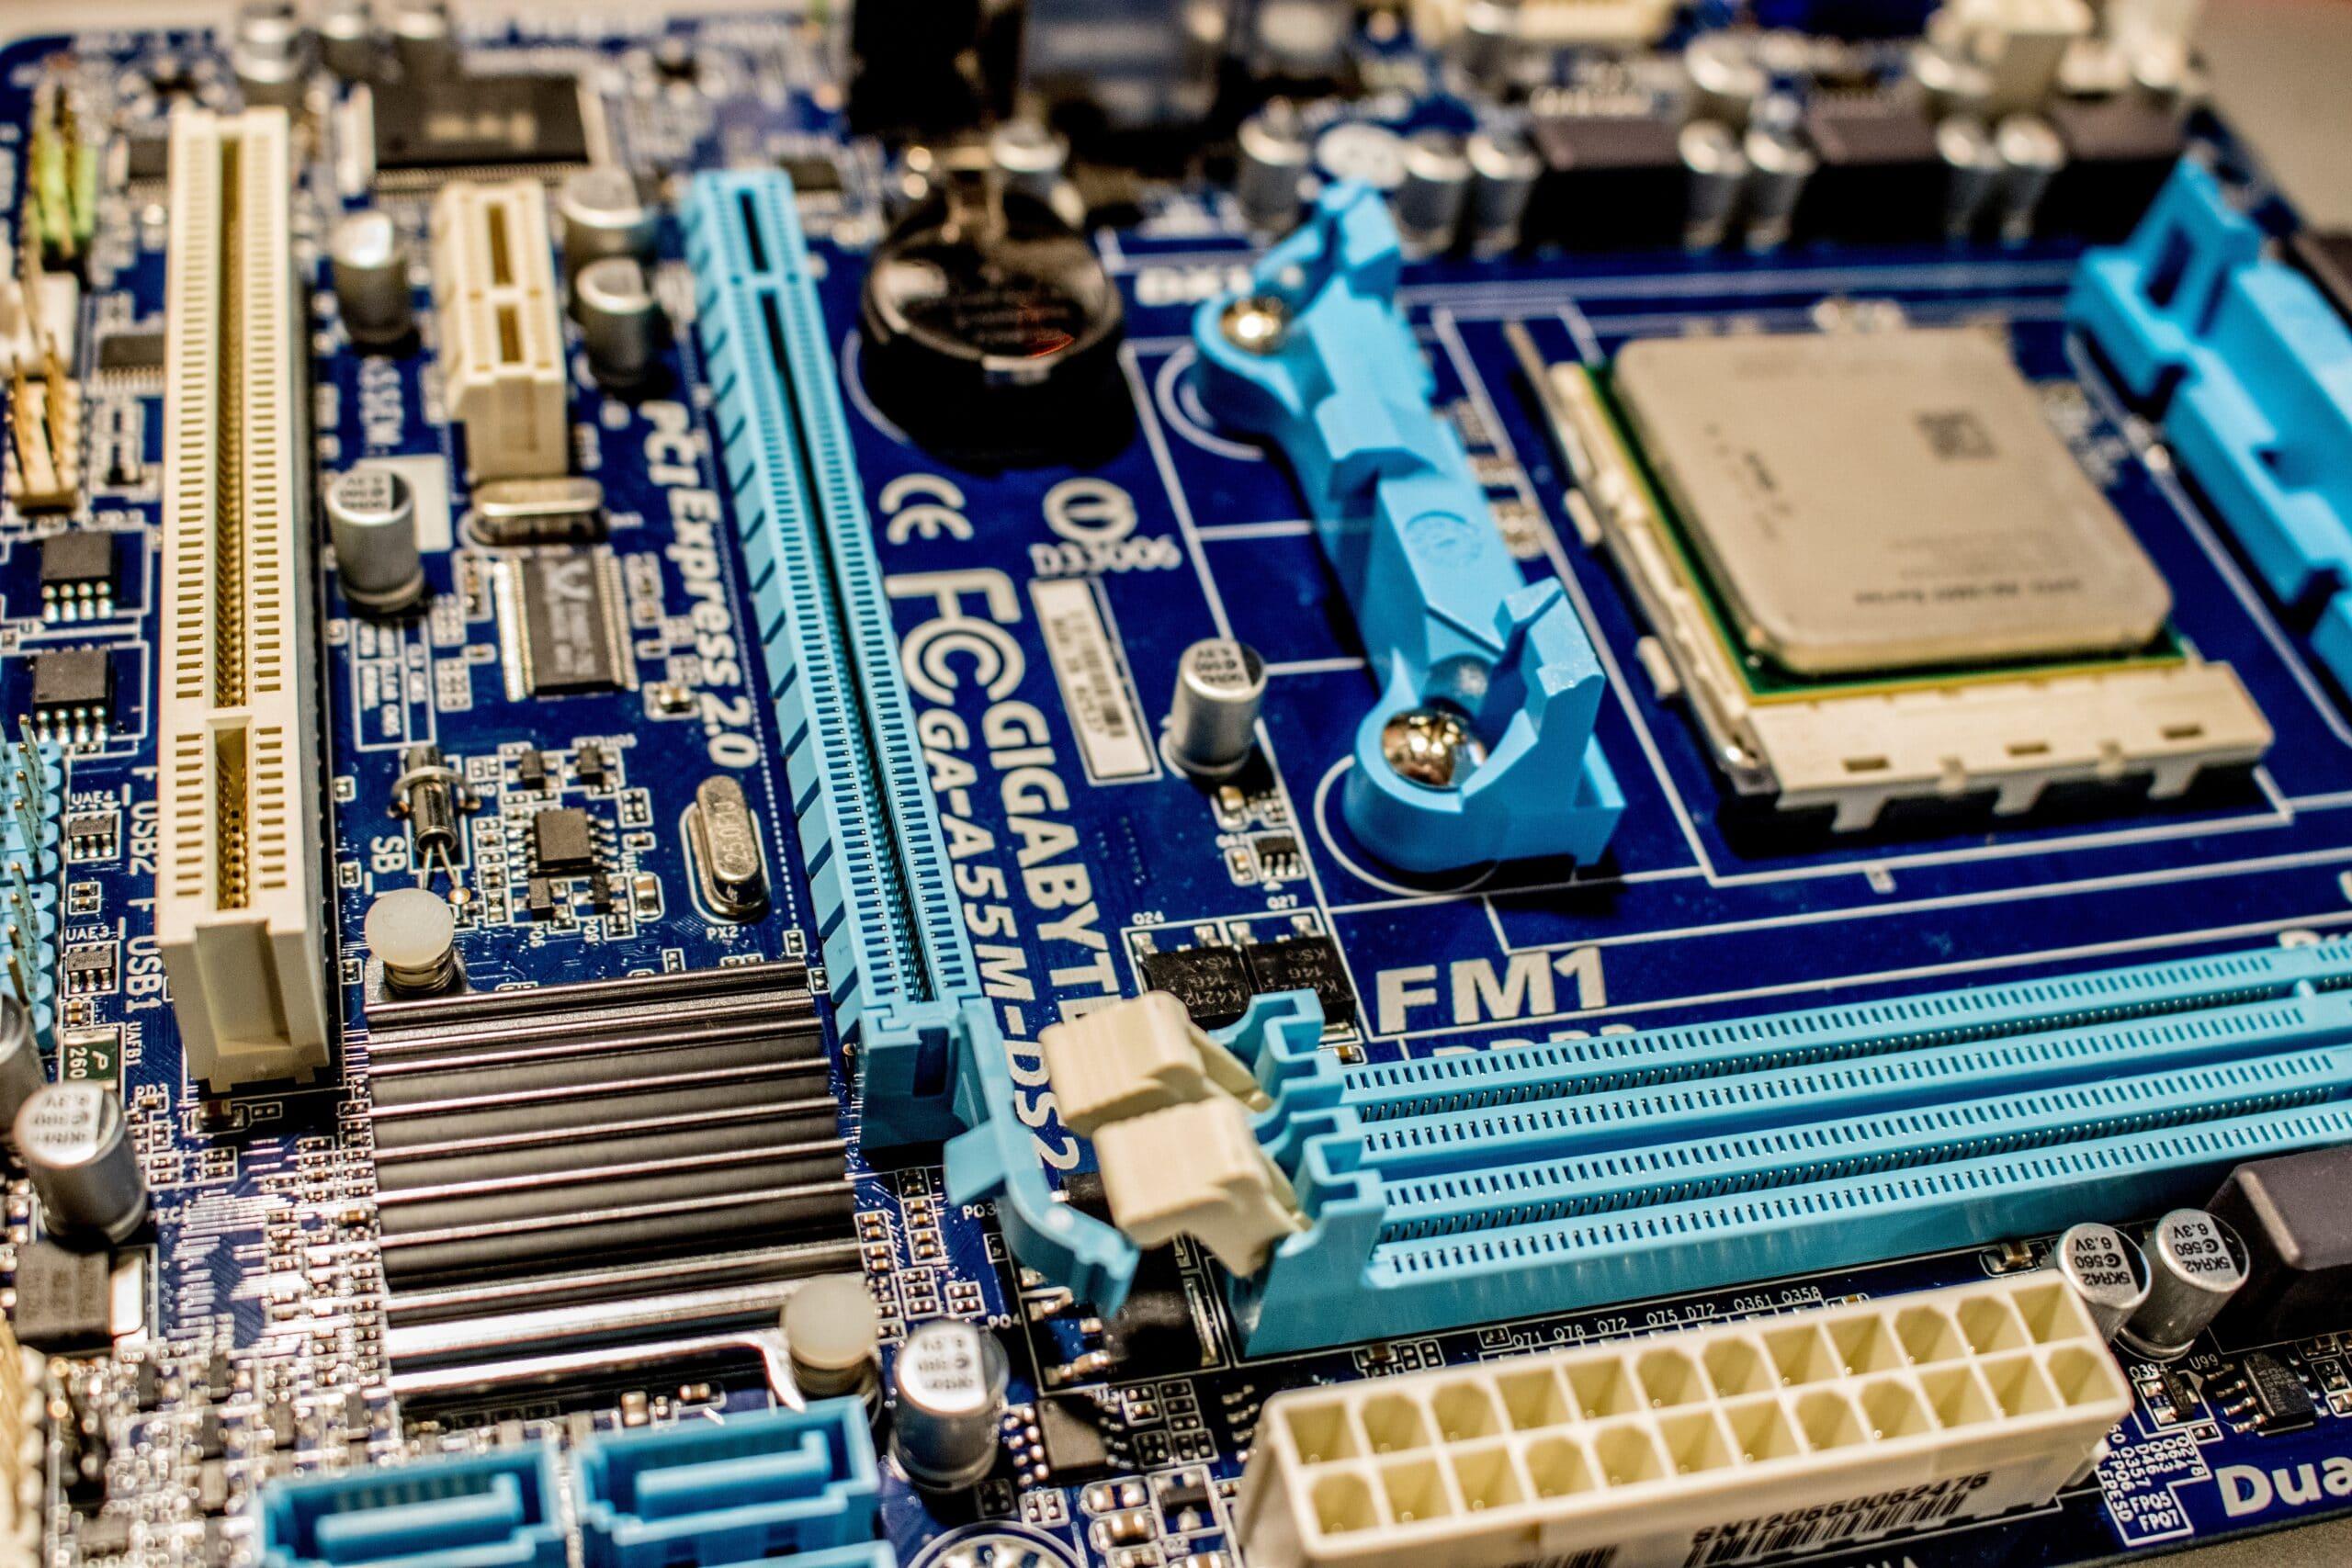 green-and-blue-computer-ram-stick-3665443